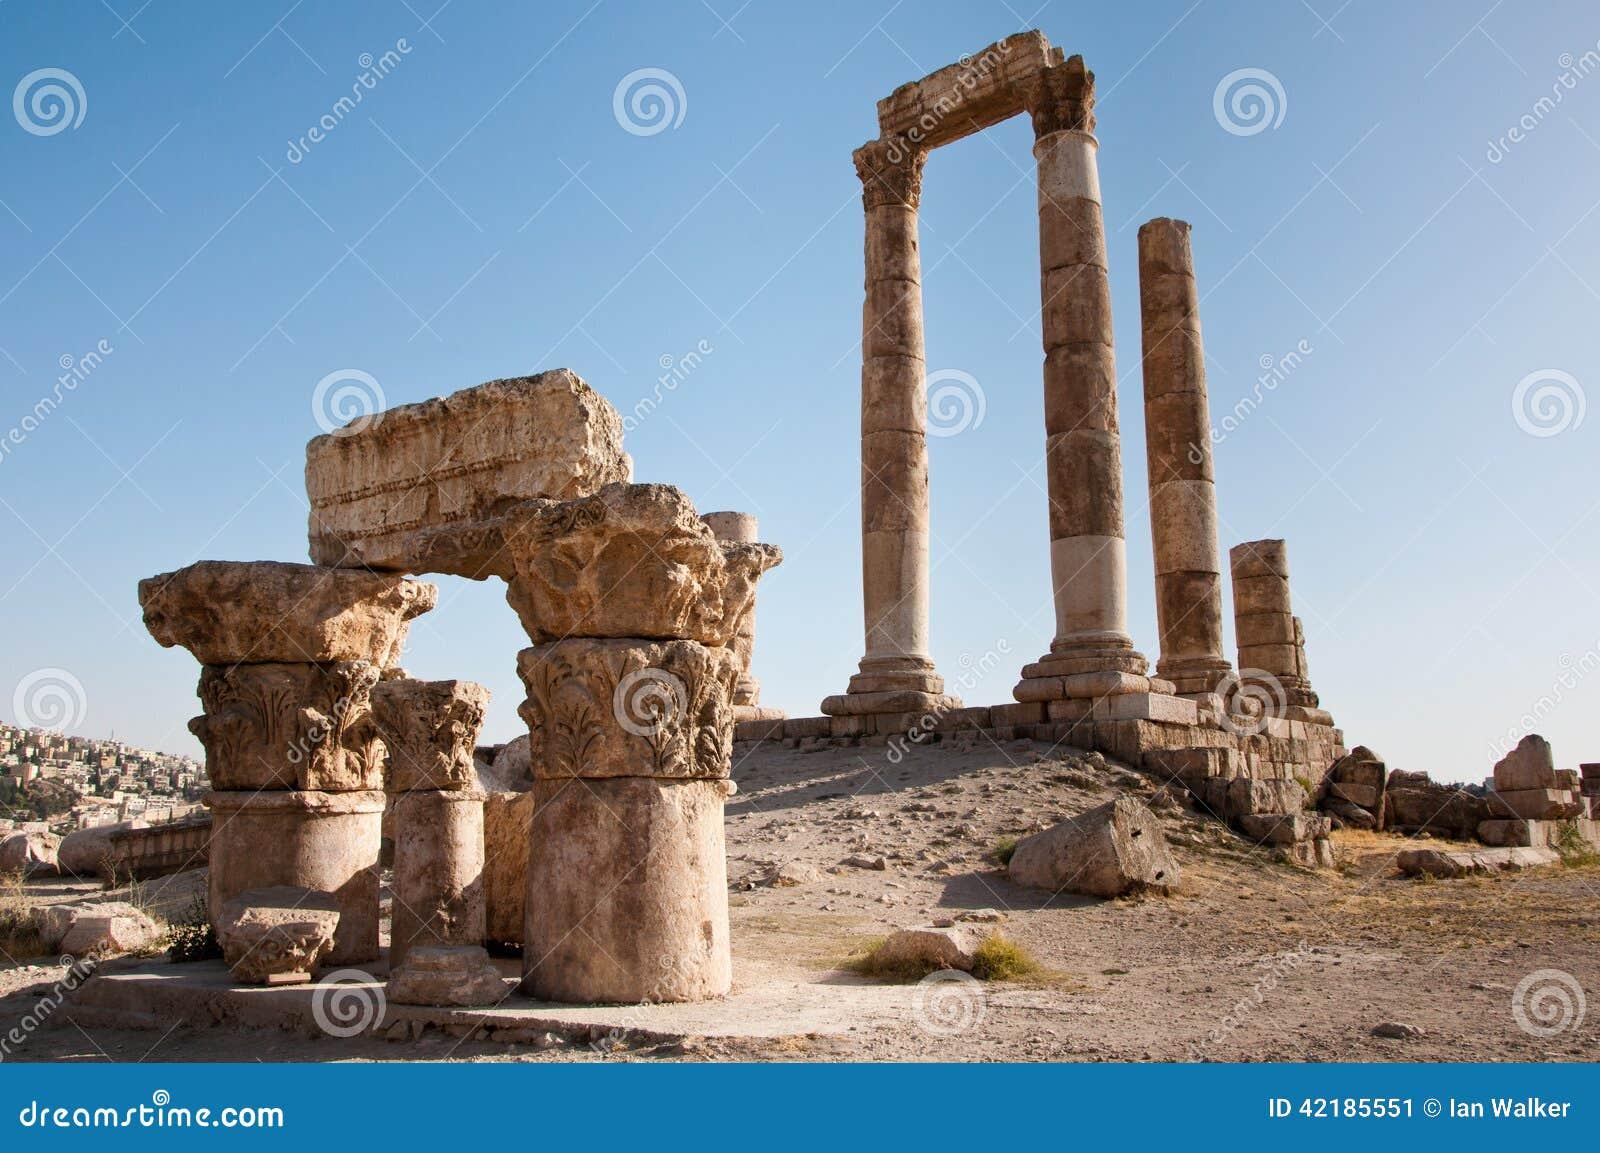 Dating Αμμάν Ιορδανία Ποια πέτρα είναι καταλληλότερη για την ραδιομετρική χρονολόγηση